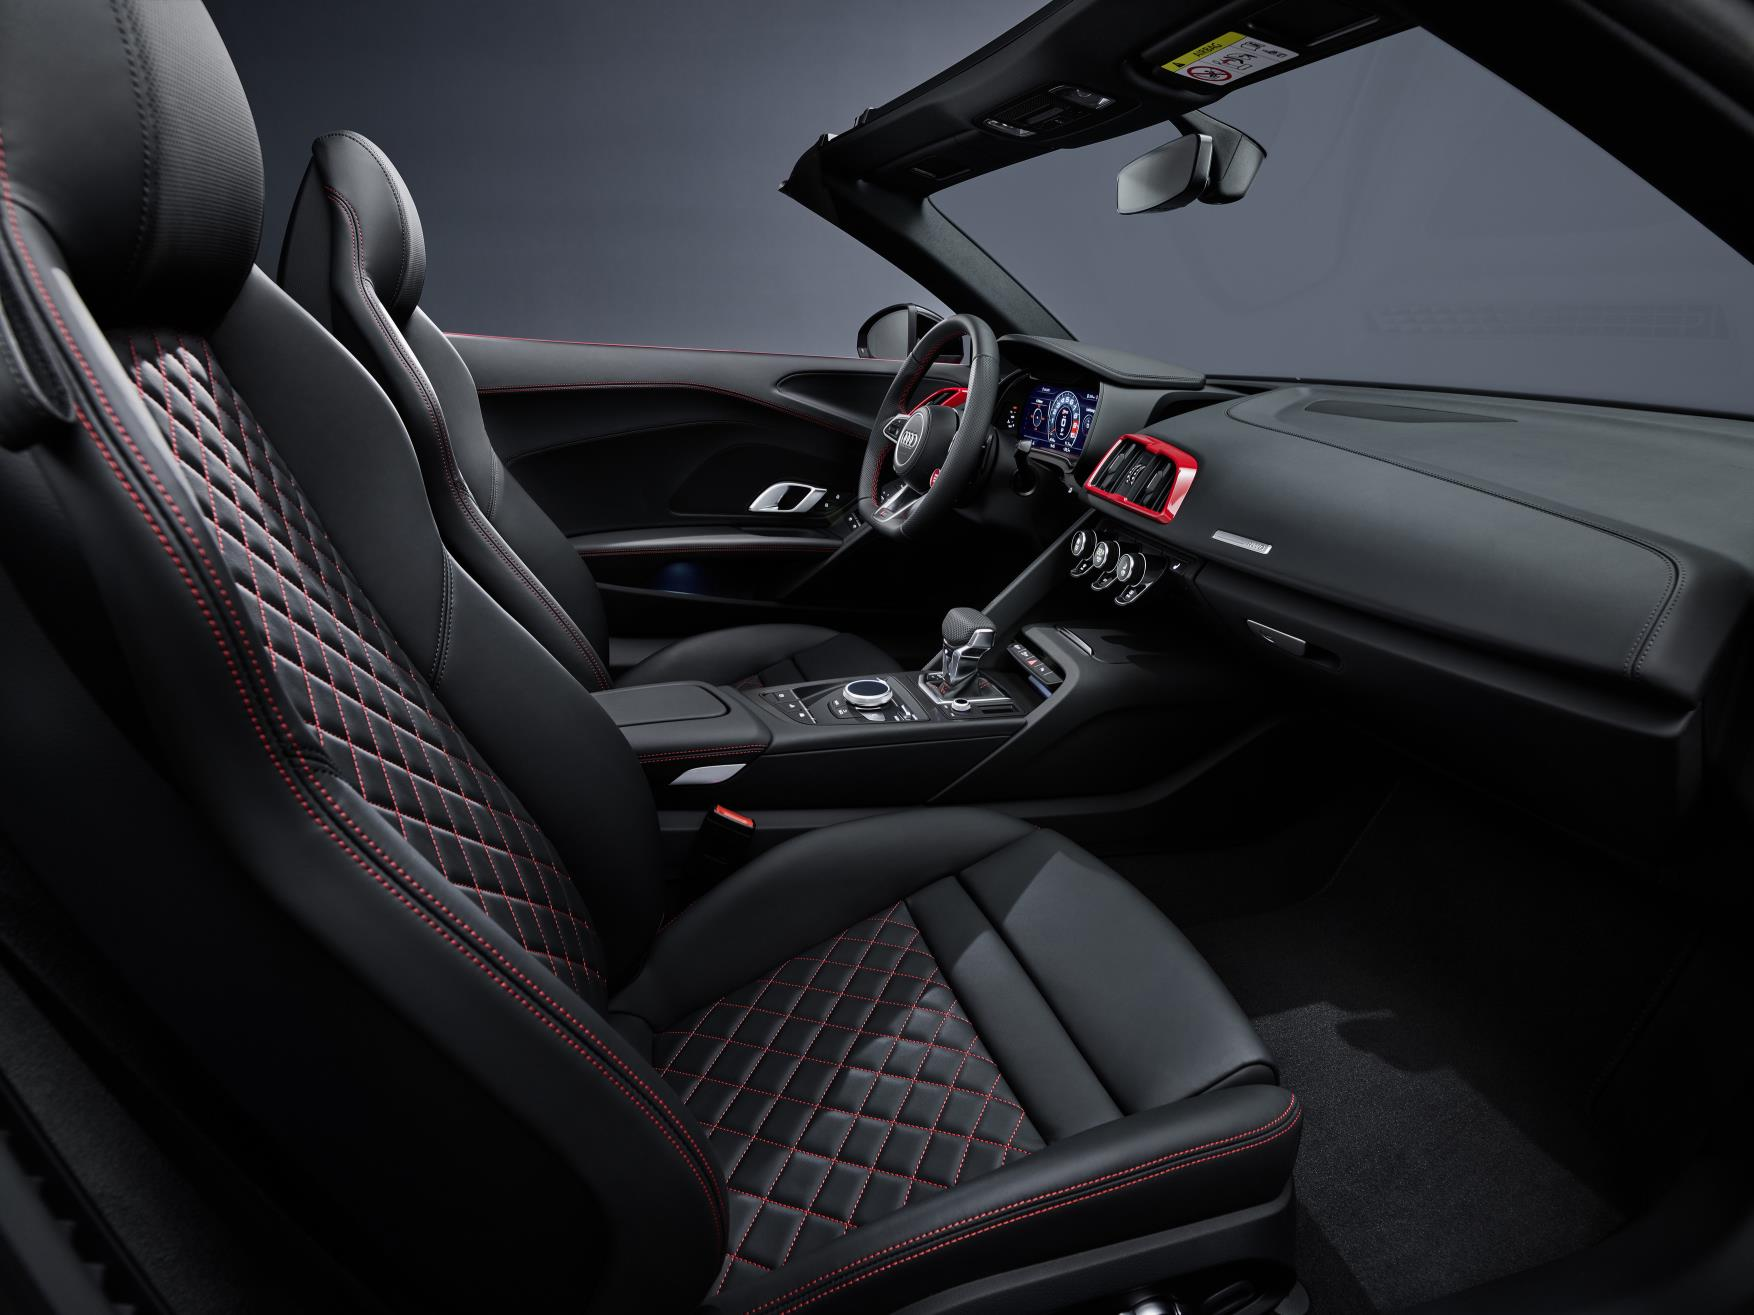 2020 Audi R8 RWD Spyder Interior